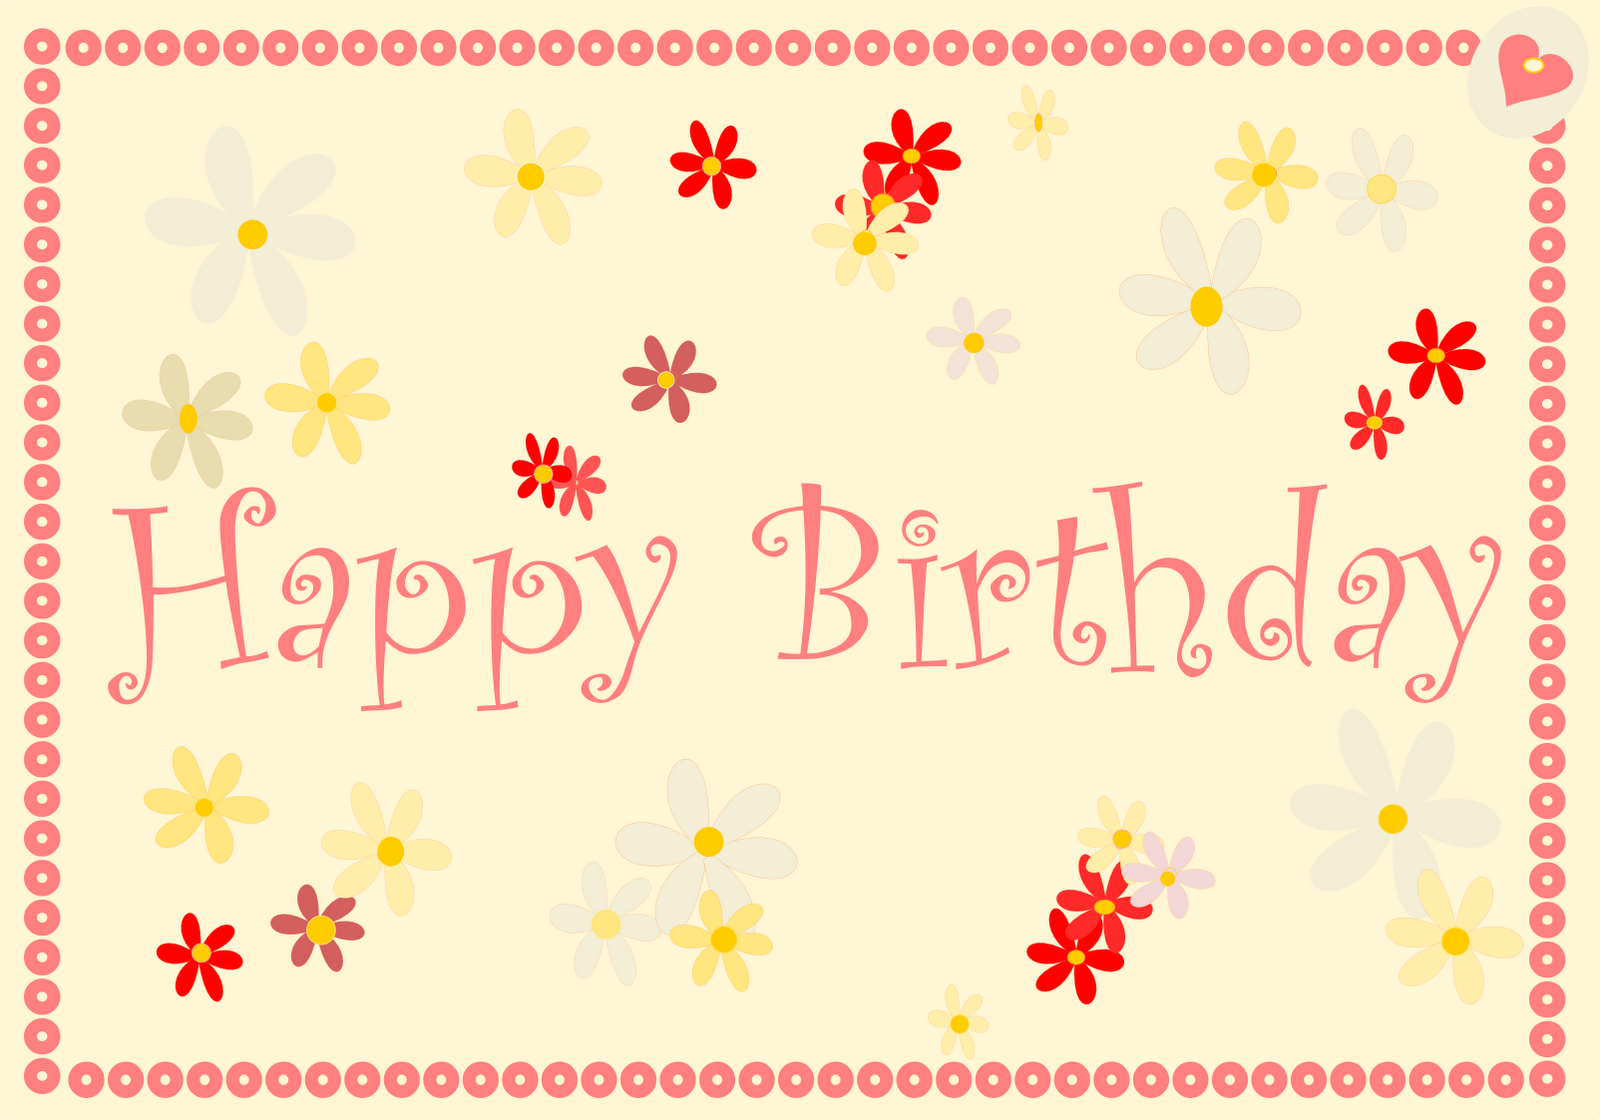 Free Wallpaper Birthday Card WallpaperSafari – Birthday Greetings Download Free